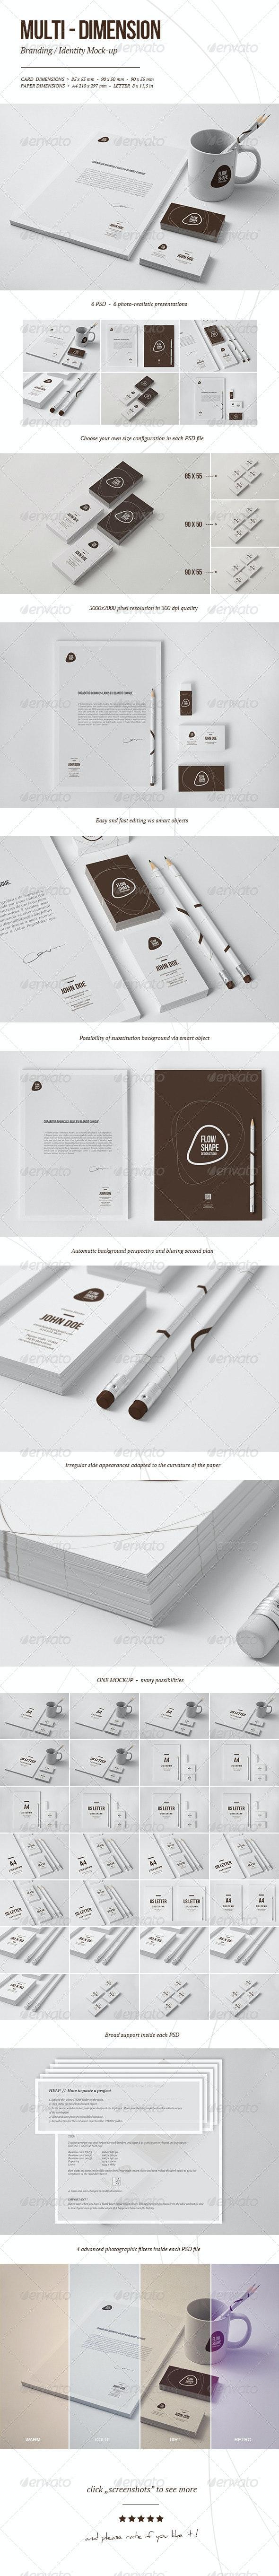 Multi-dimension Branding / Identity Mock-up 4 - Stationery Print